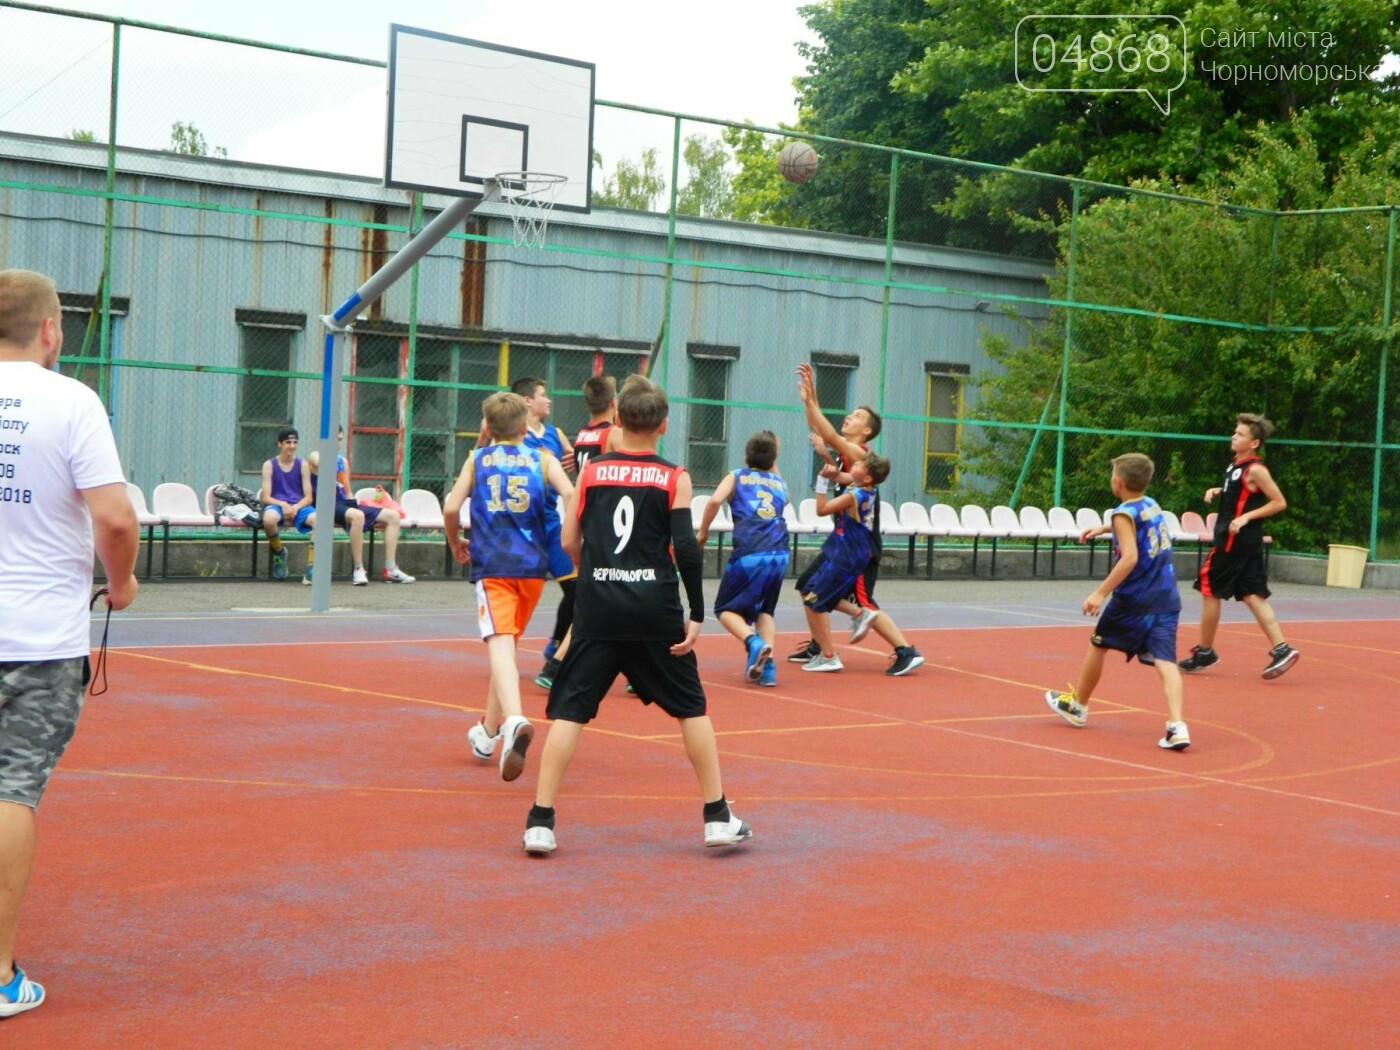 Баскетболу в Черноморске - «В добрый час!», фото-4